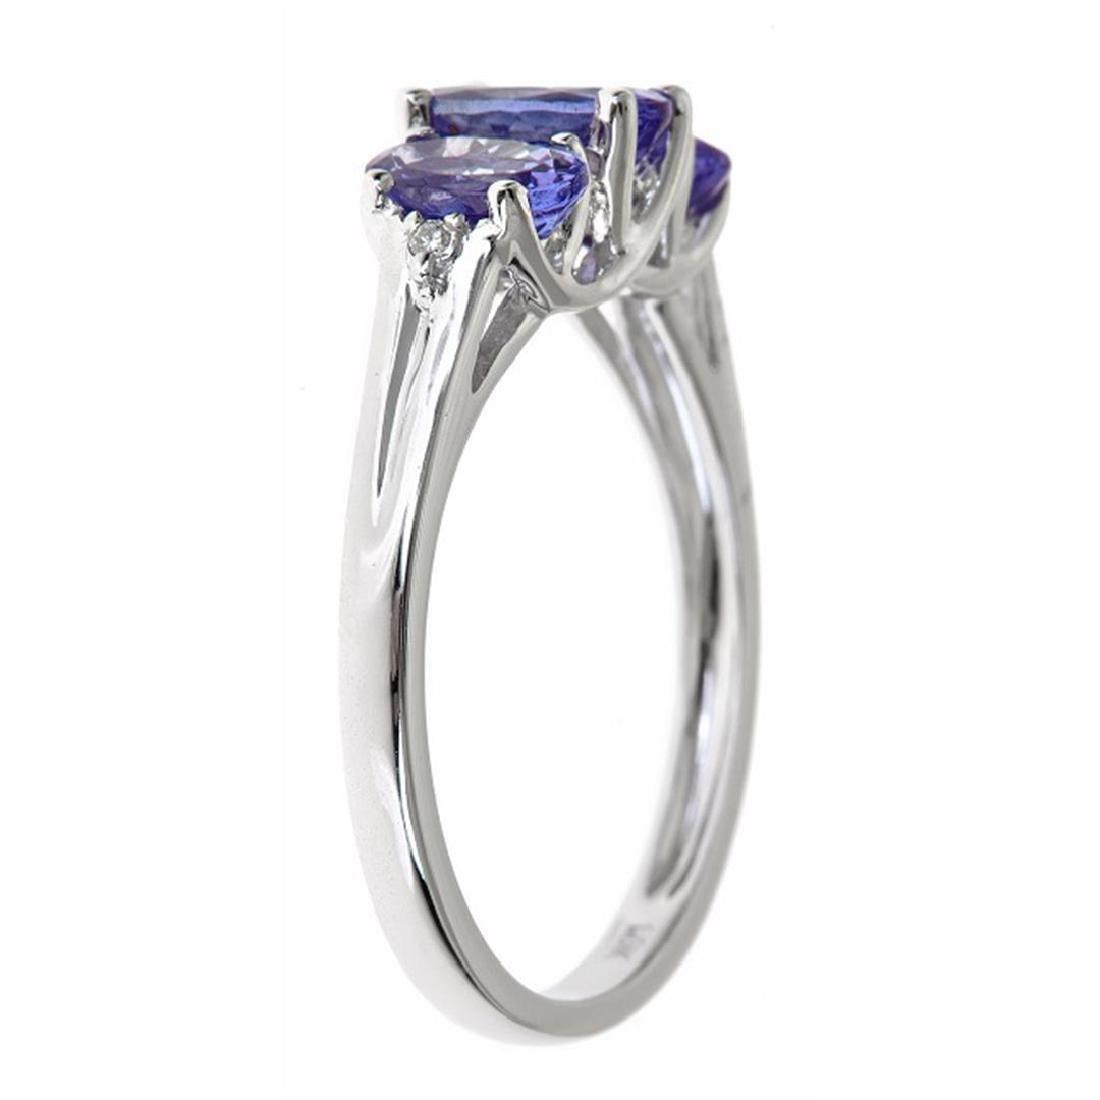 1.67 ctw Tanzanite and Diamond Ring - 10KT White Gold - 2